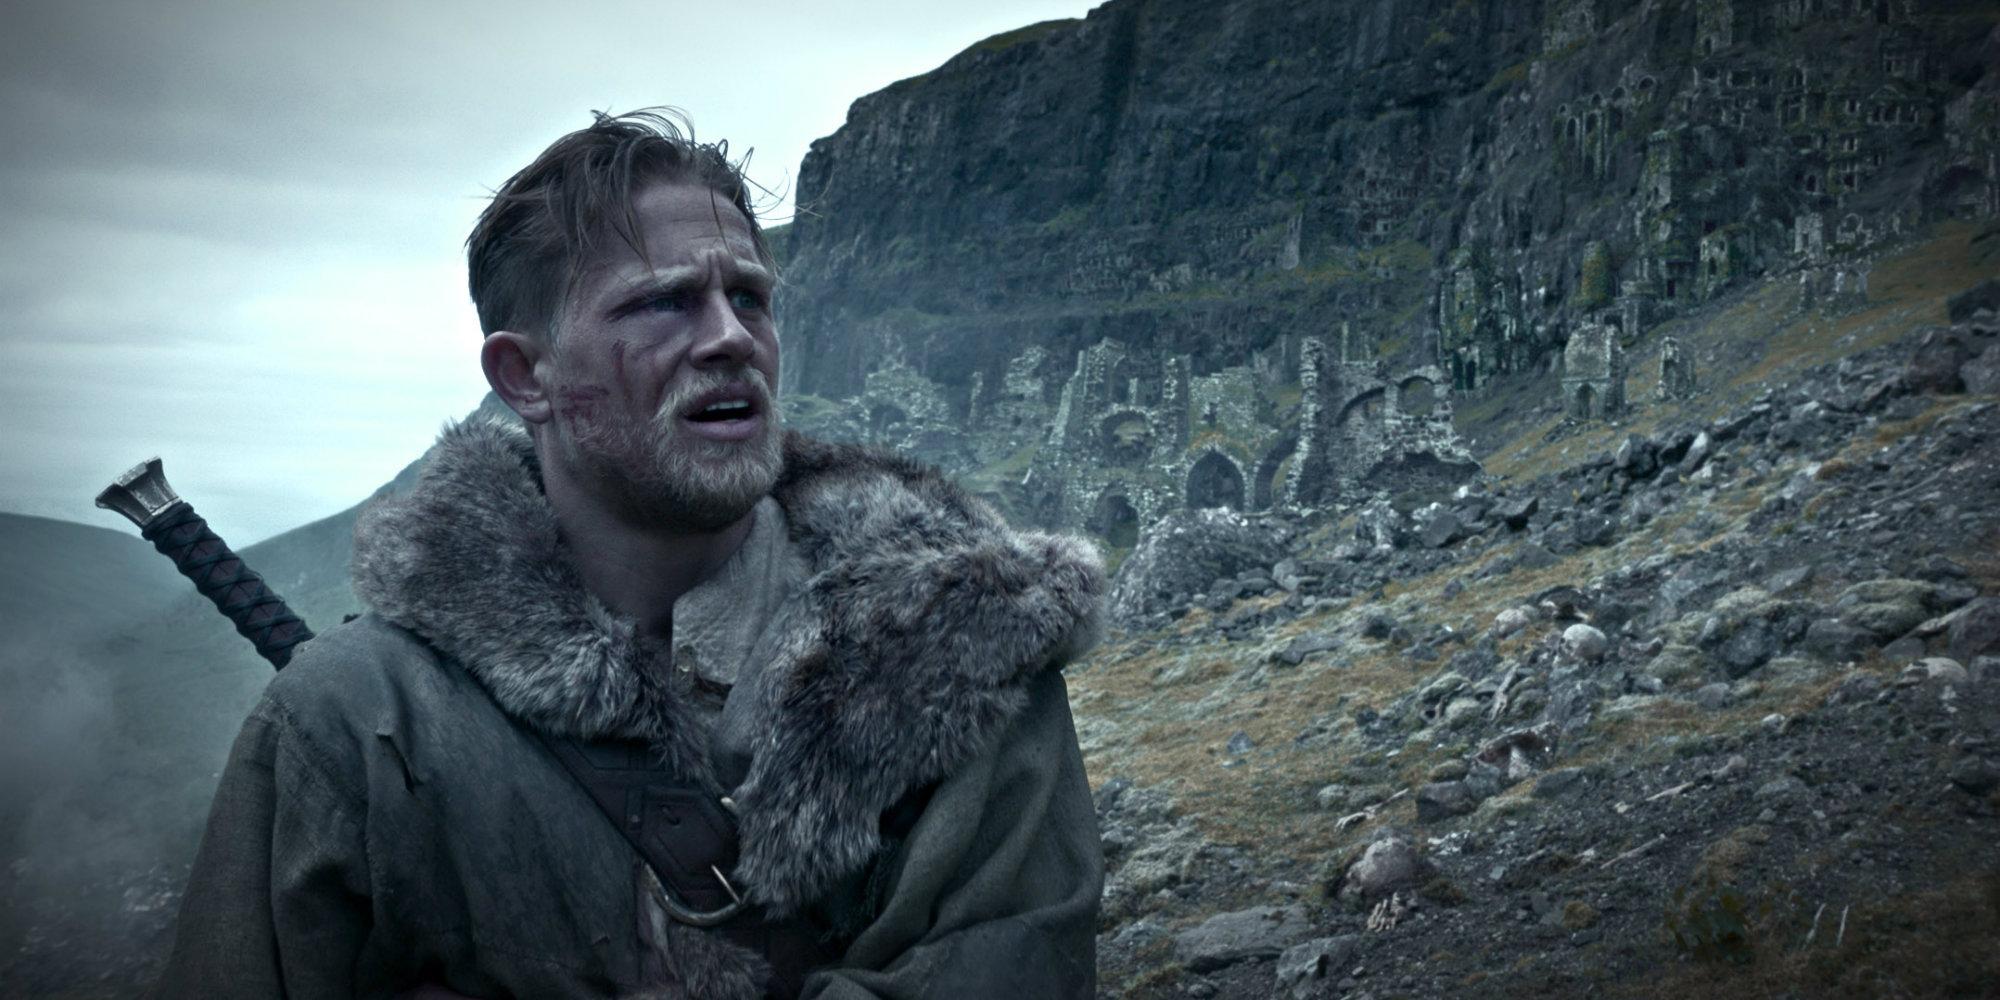 King Arthur: Legend of the Sword - Charlie Hunnam